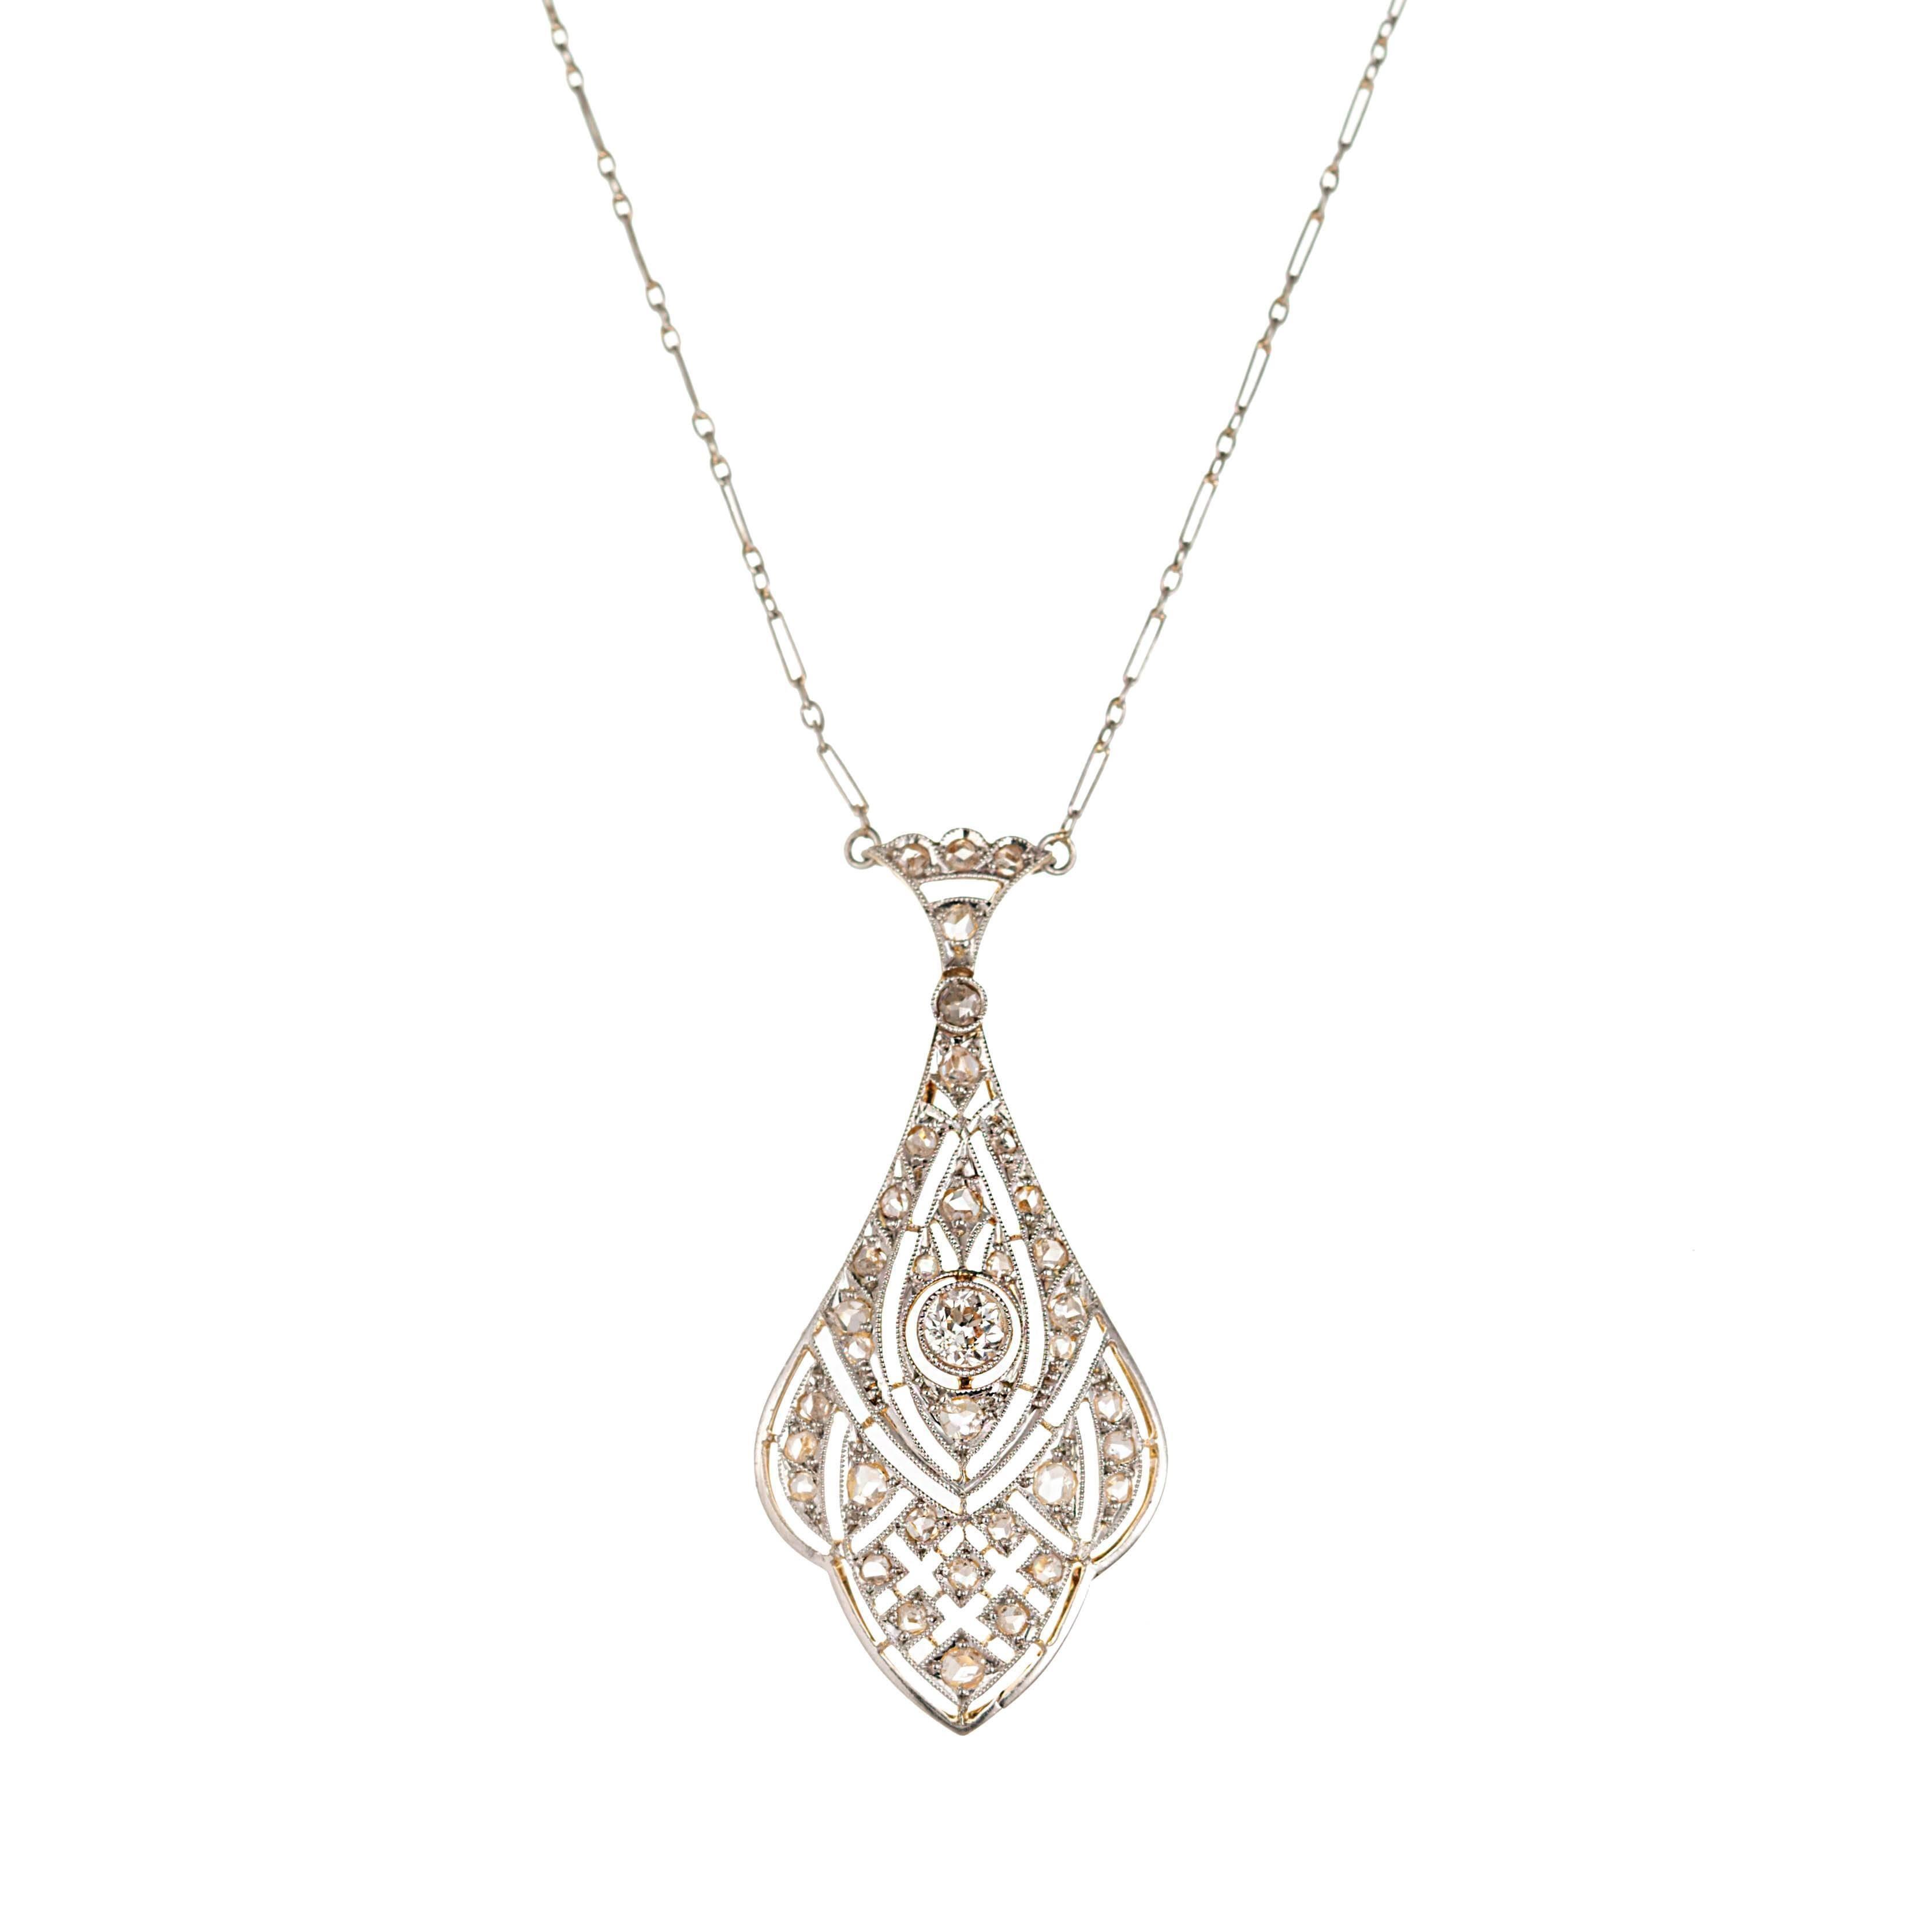 Edwardian European Rose-Cut Diamond Platinum Gold Pendant Necklace